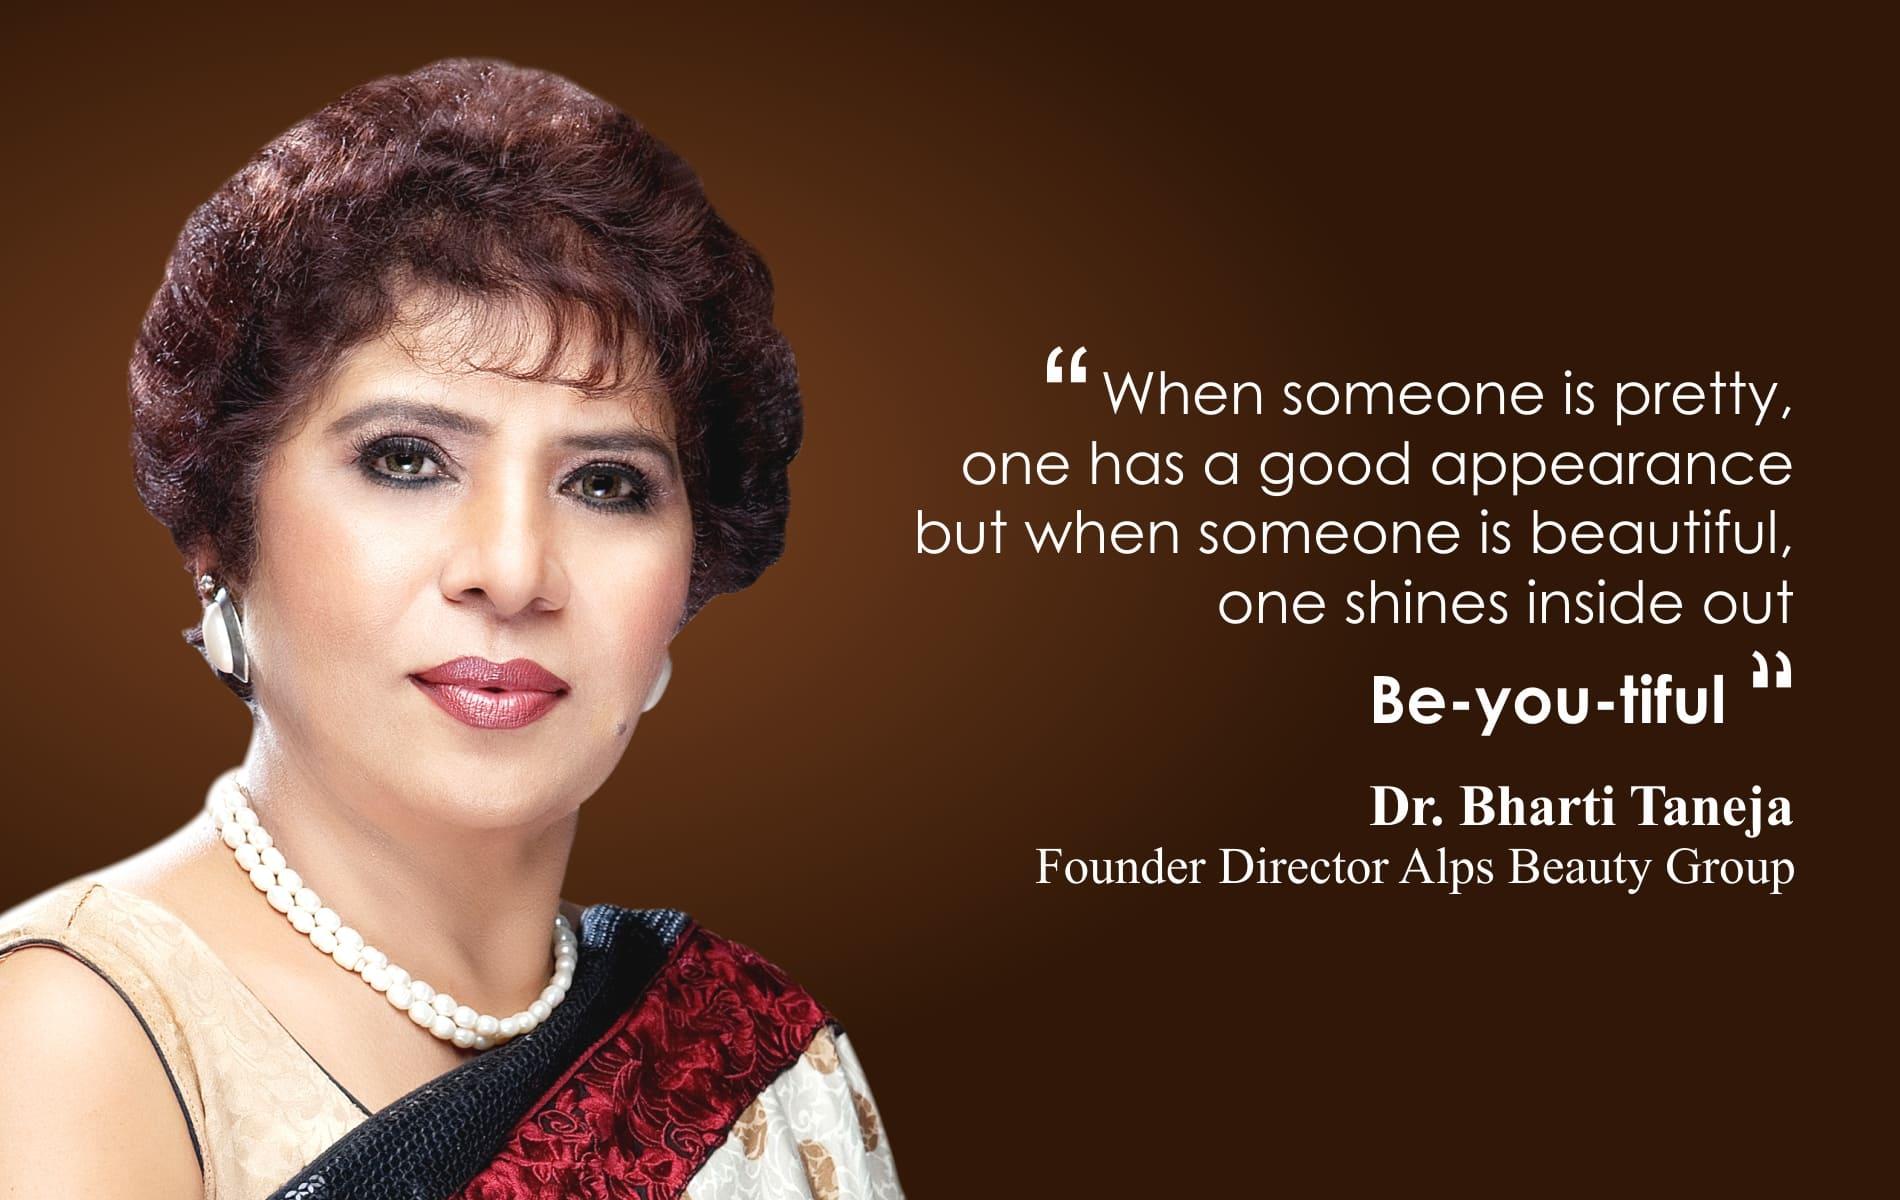 Dr  Bharti Taneja's Alps Beauty Group - Beauty Clinic, Makeup Academy